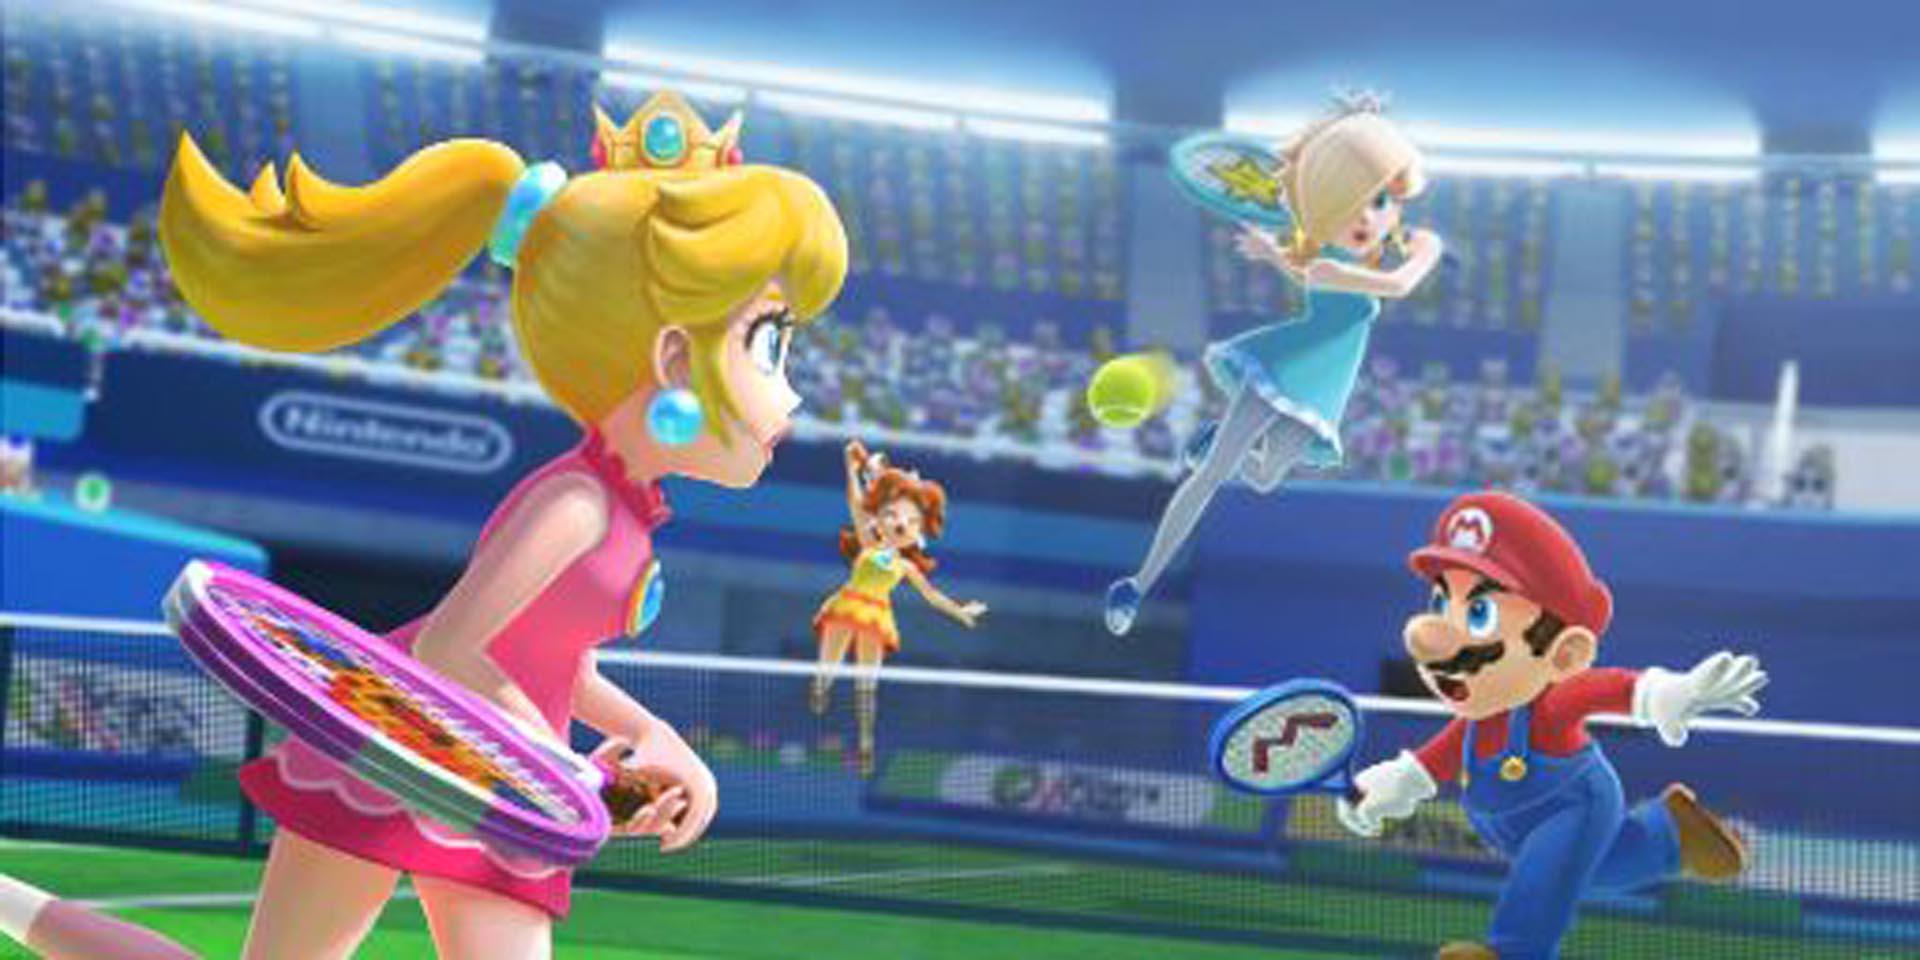 4_N3DS_MarioSportsSuperstars_Screenshot_CTRP_AUN_illu05_R_ad